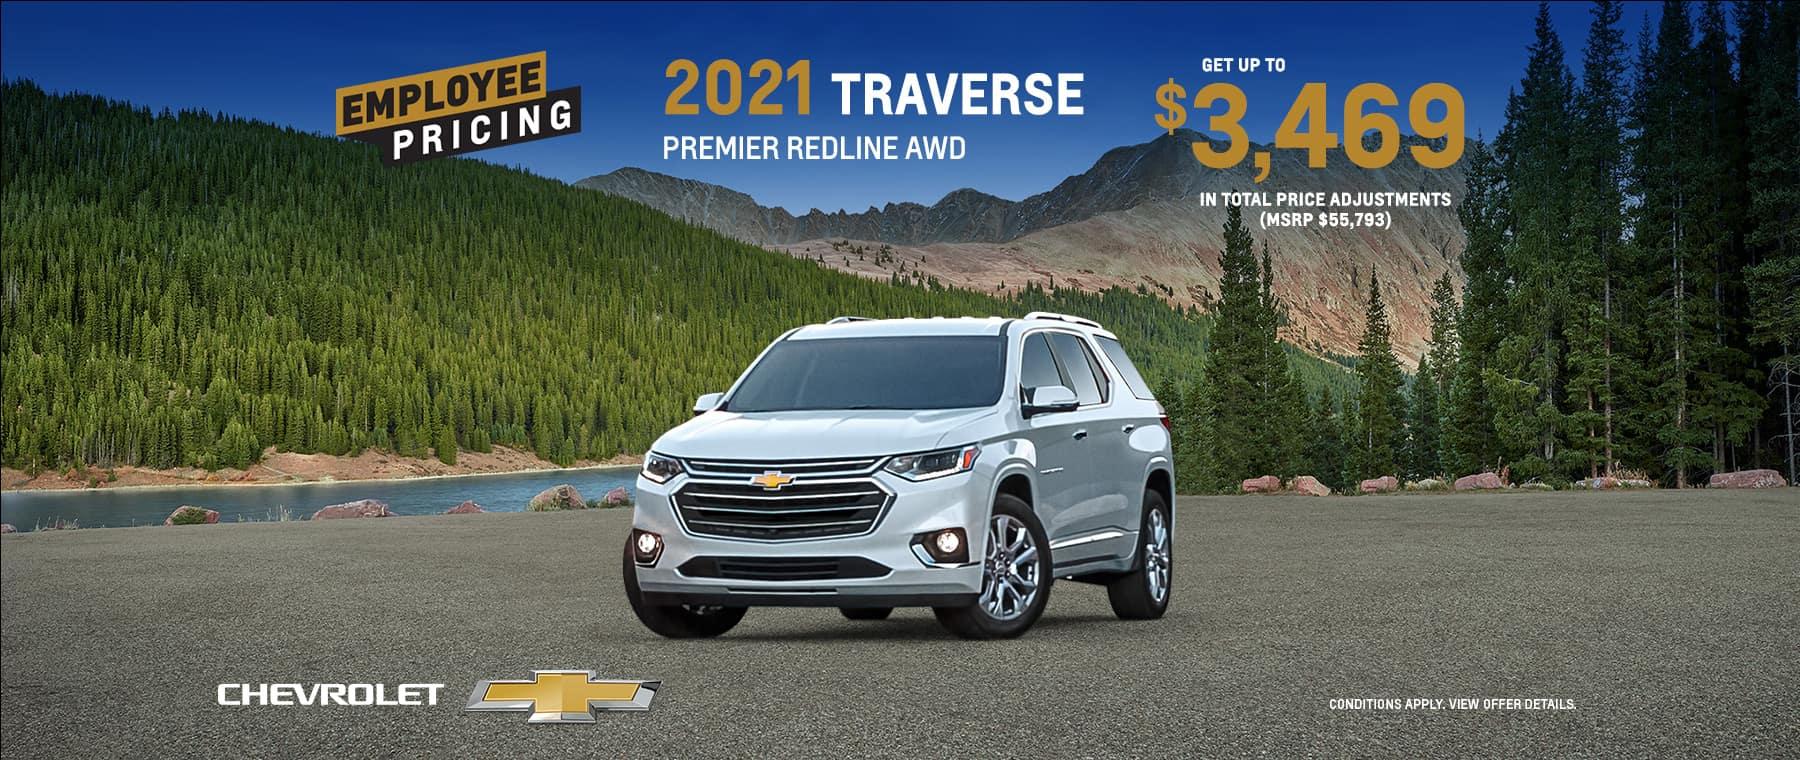 2021_JUNE_WST_Chevy_T3_EN_1800x760_CAR-SUV_TRAVERSE